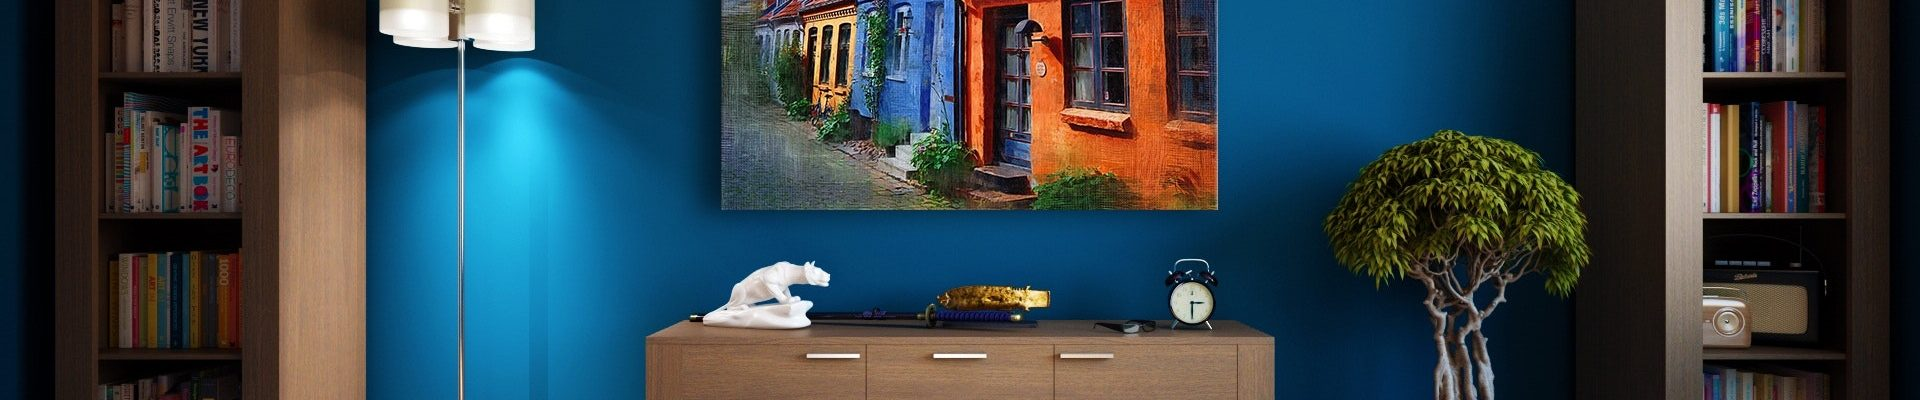 rent-furniture-online-apartment-bookcase